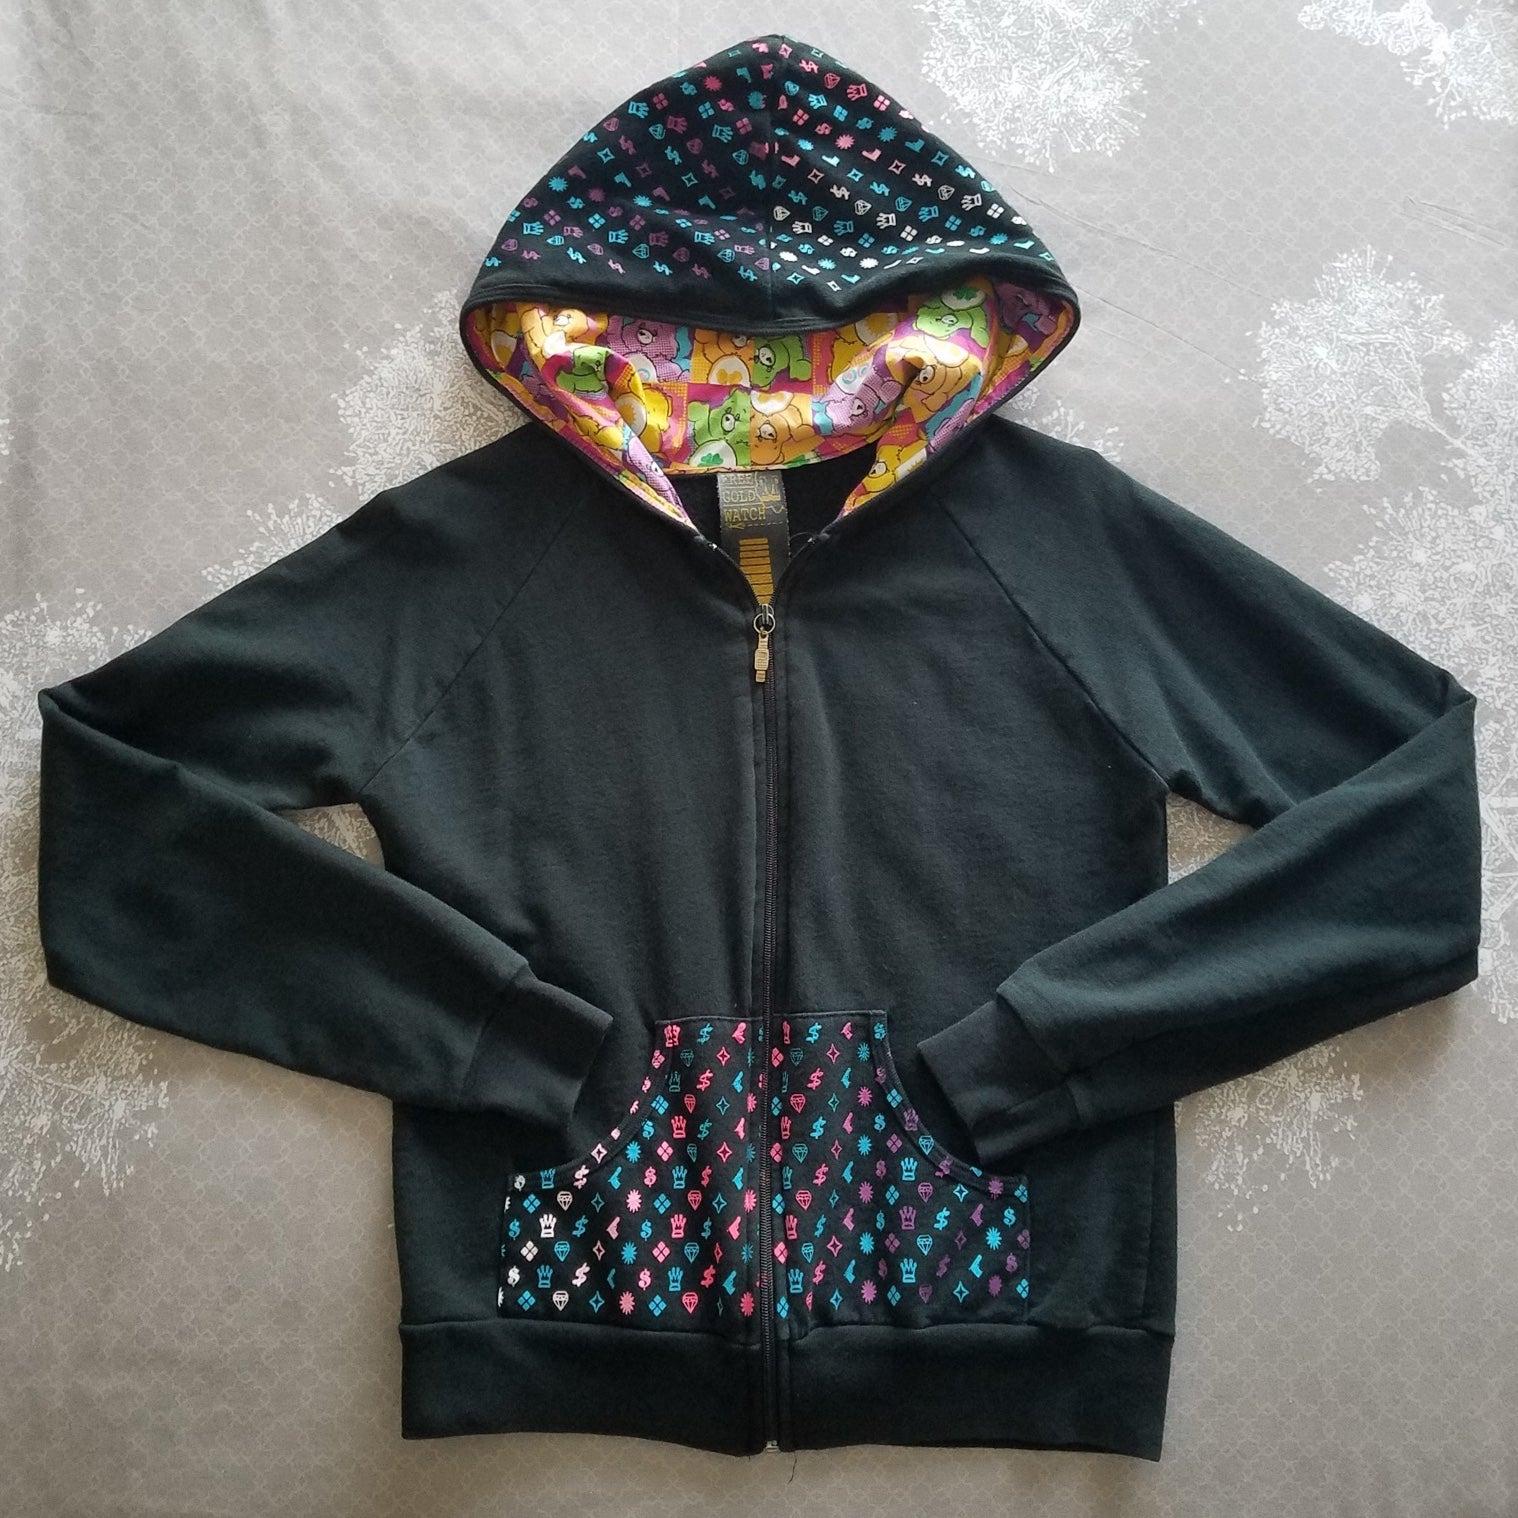 American Apparel x FreeGoldWatch hoodie